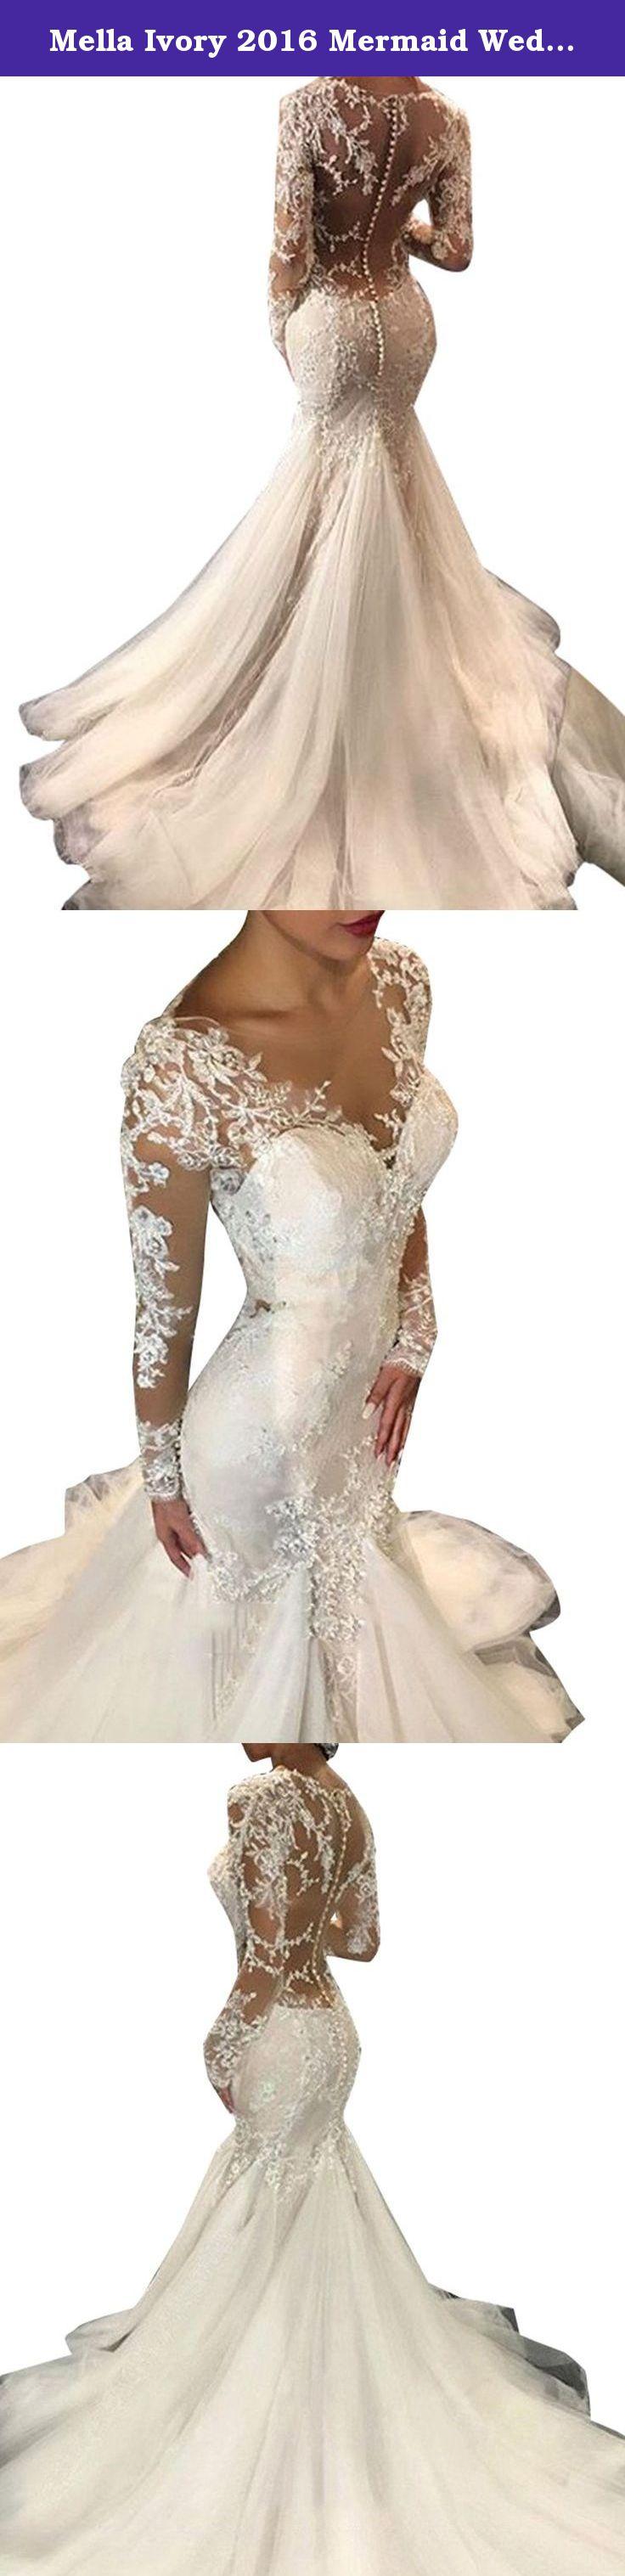 66b929761a8 Mella Ivory 2016 Mermaid Wedding Dresses Long Sleeves Lace Hand-Beaded  Sheer Back Sexy Bridal